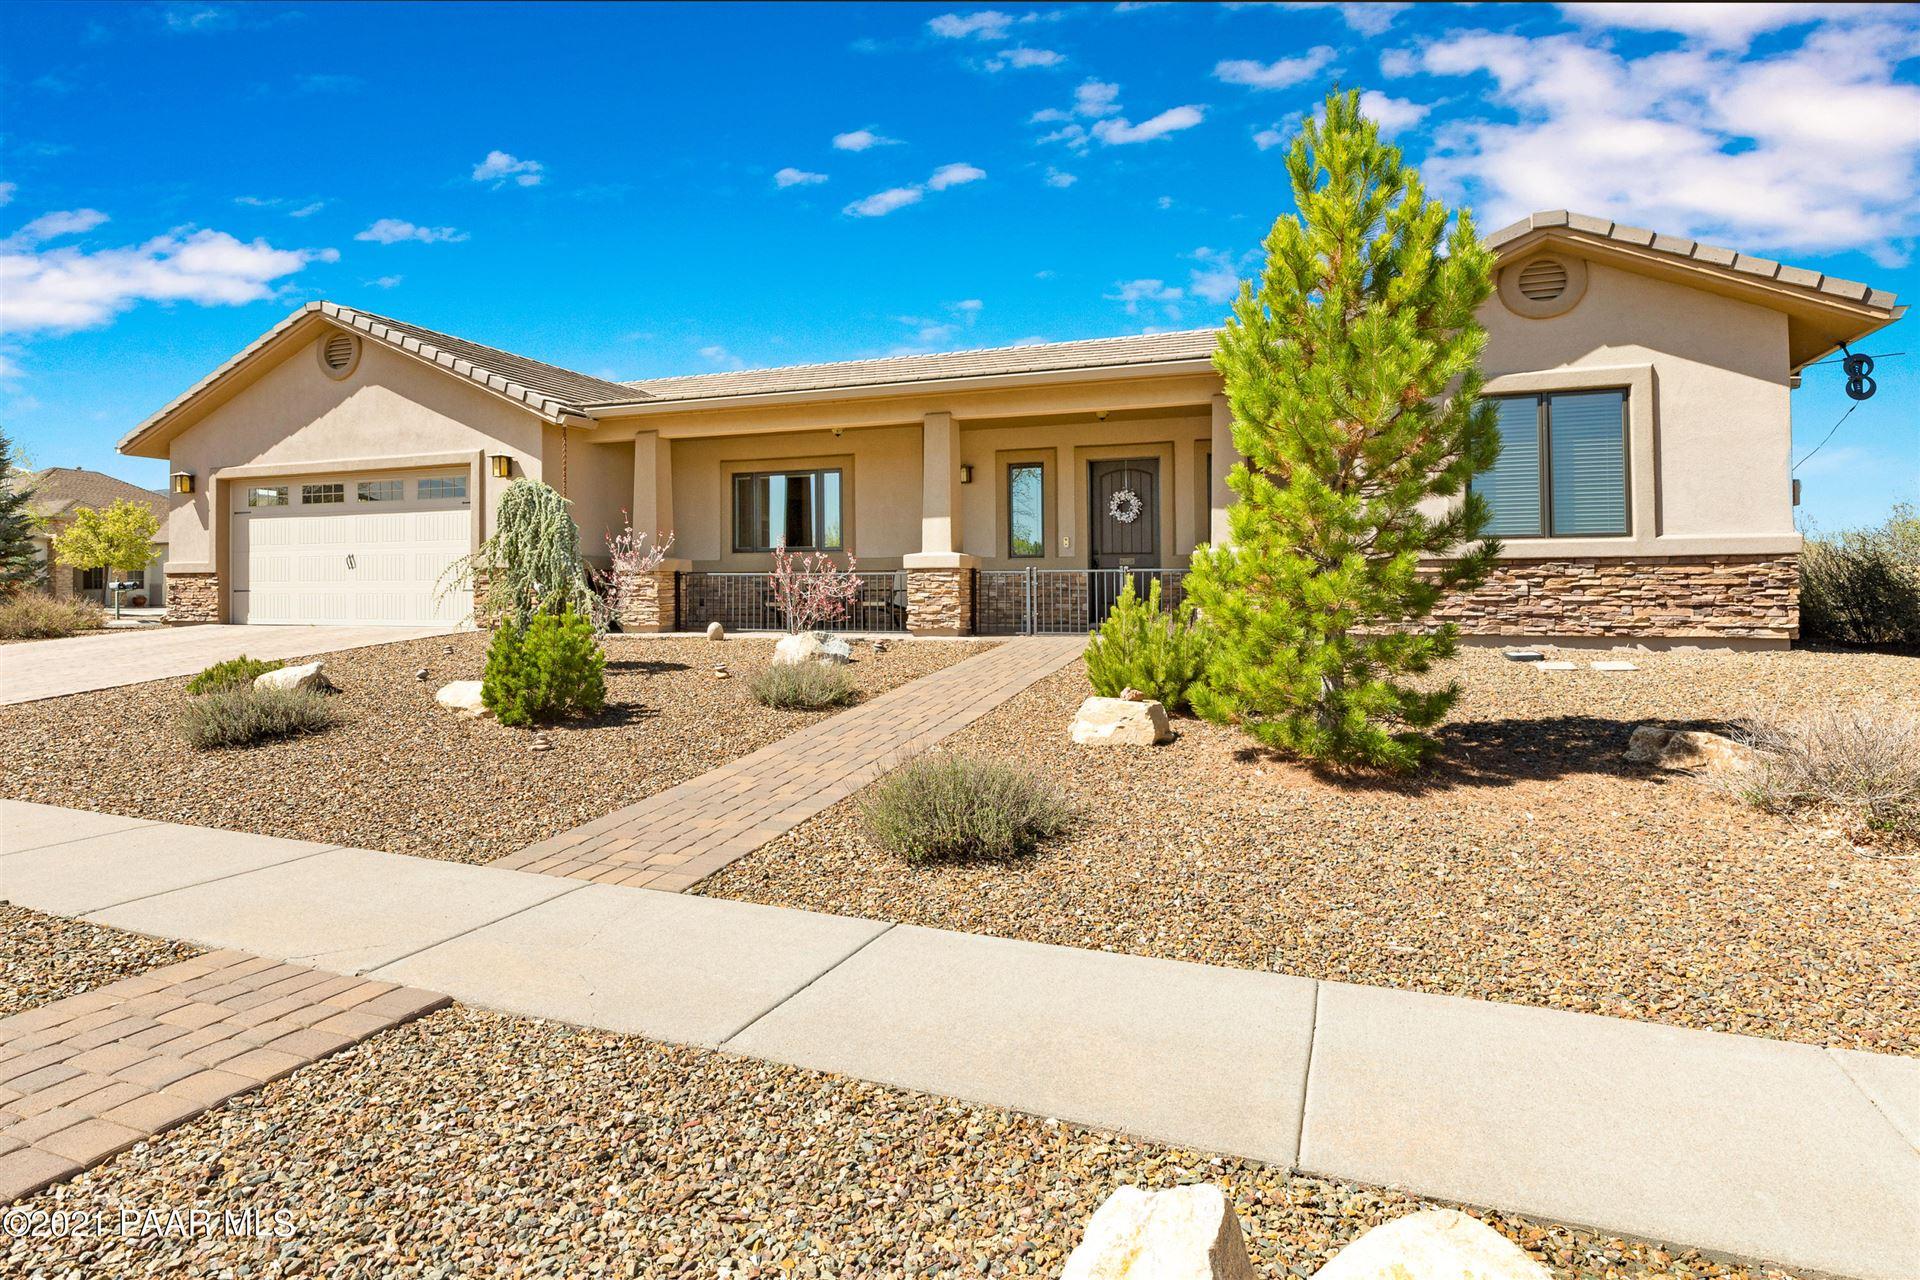 Photo of 1540 N Home Fire Drive #Lot: 43, Prescott Valley, AZ 86314 (MLS # 1040404)